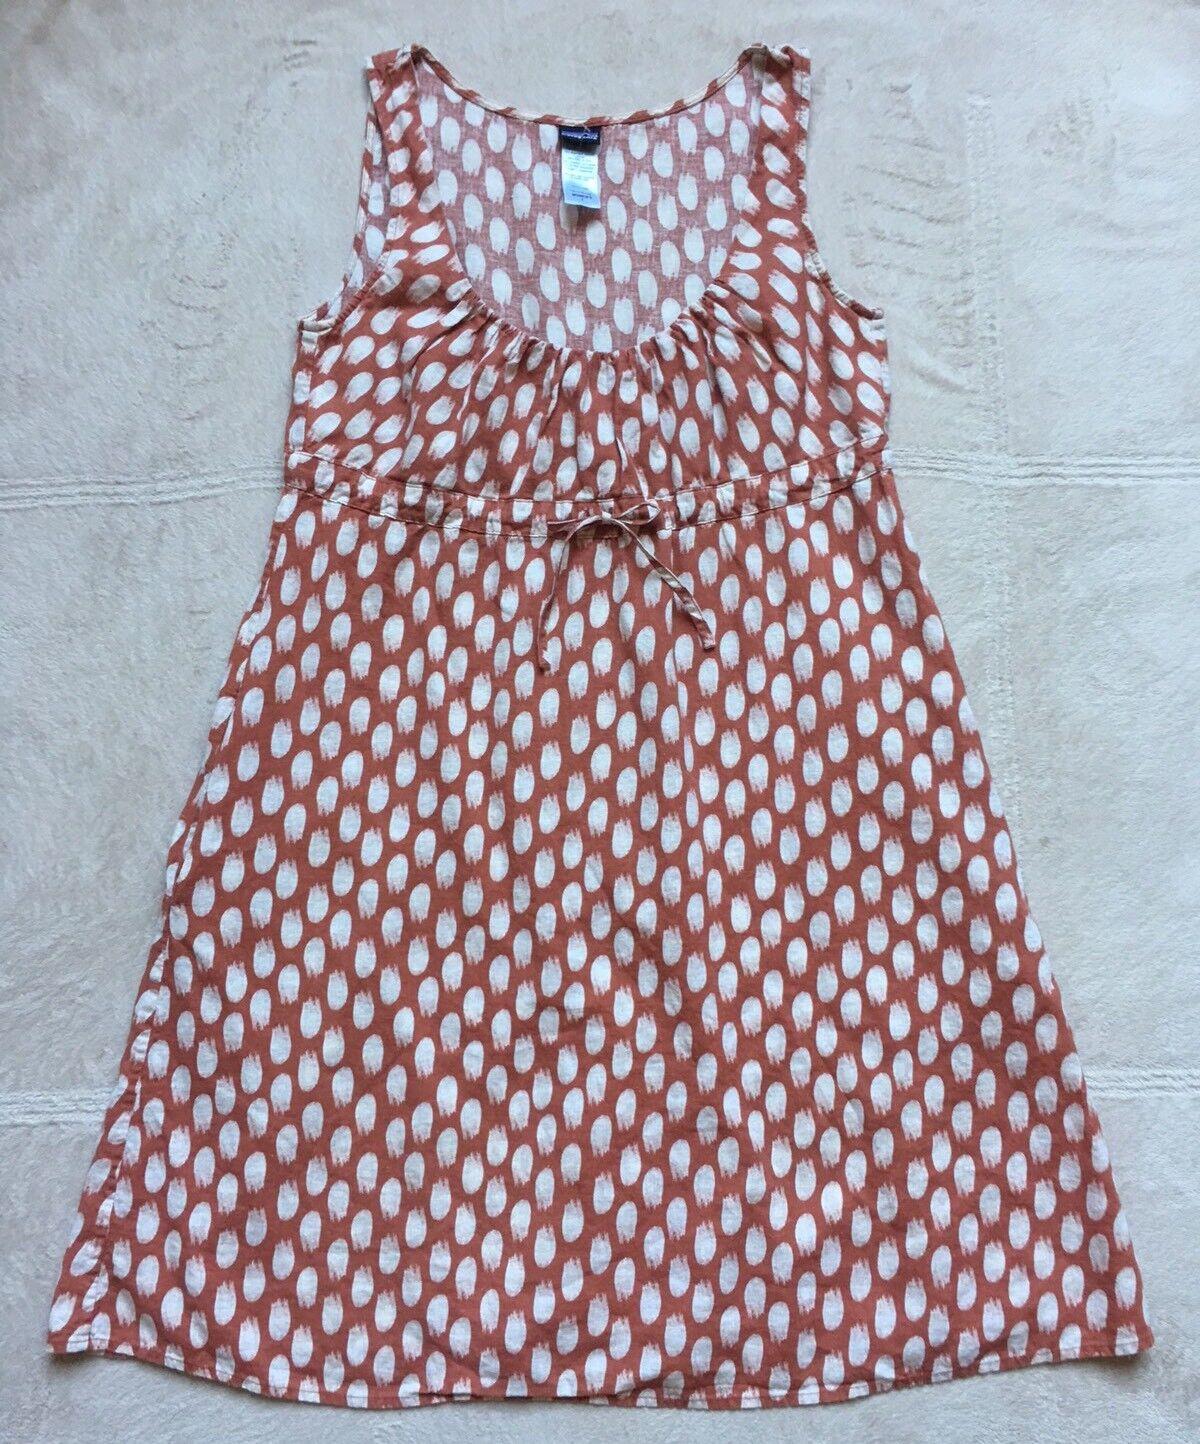 Patagonia Women's Tank Dress, Size Small, Ivory & Brown Polka-Dots, Waist Tie